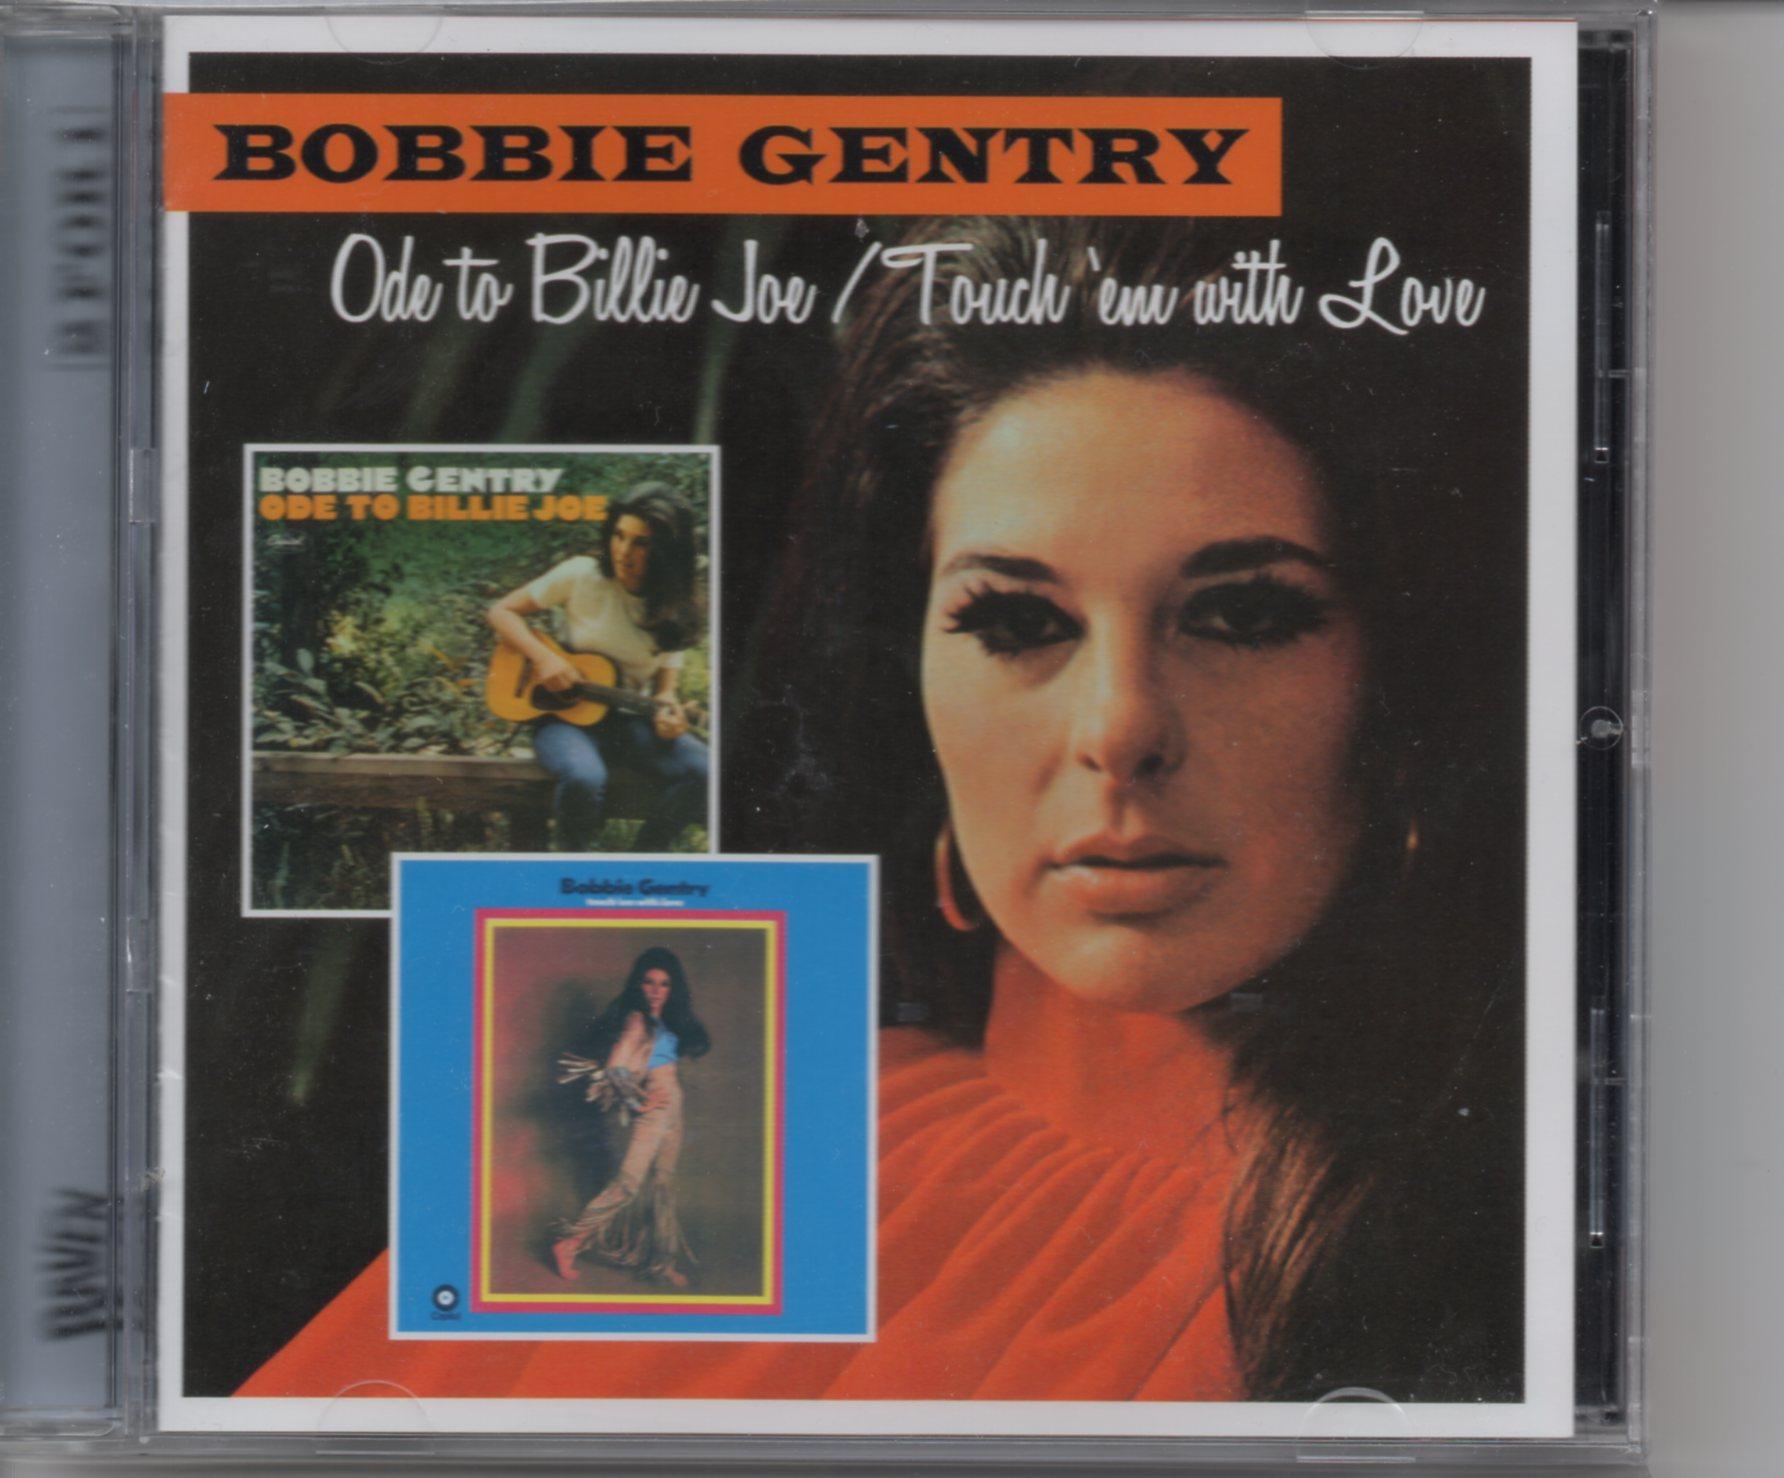 Bobbie Gentry - Ode To Billie Joe / Touch 'em With Love + Bonus Tracks